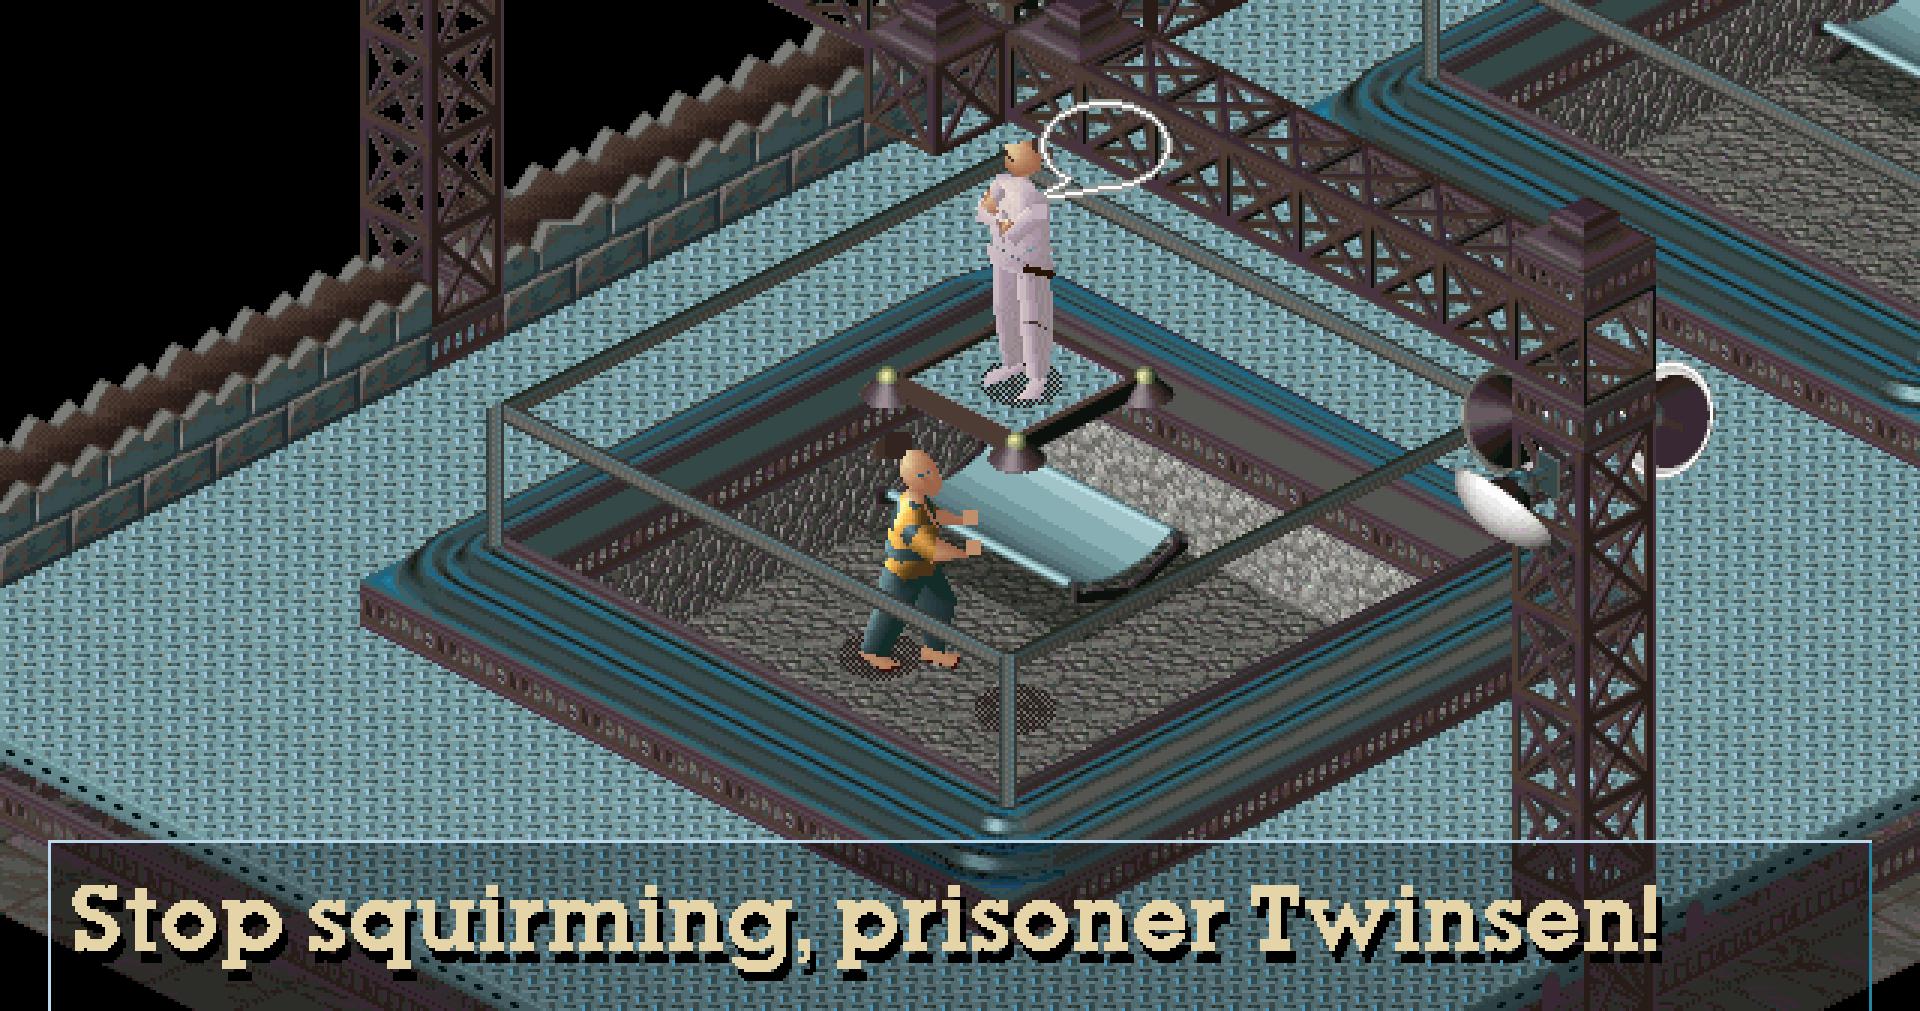 Twinsen in prison in Little Big Adventure